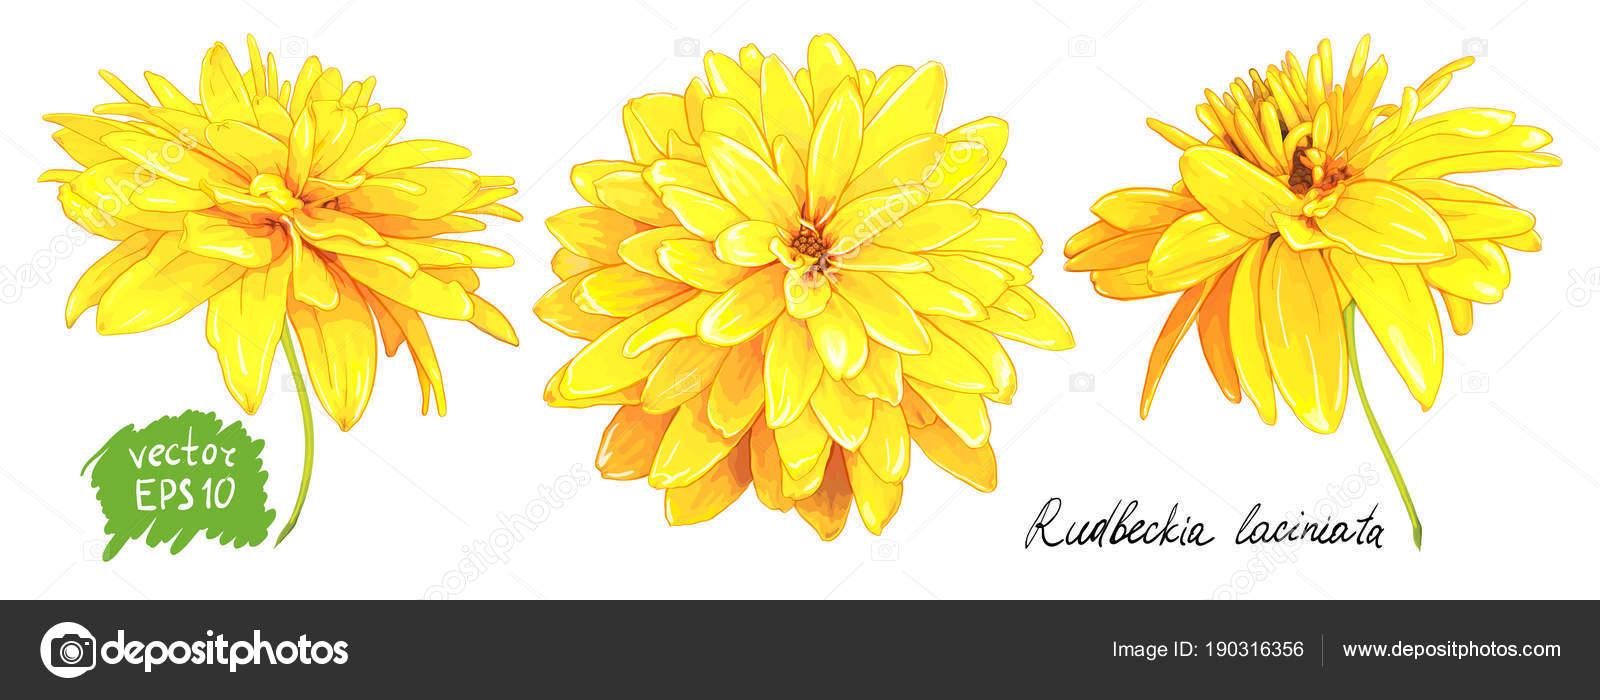 Rudbeckia laciniata yellow flower stock vector ledelena 190316356 rudbeckia laciniata yellow flower stock vector mightylinksfo